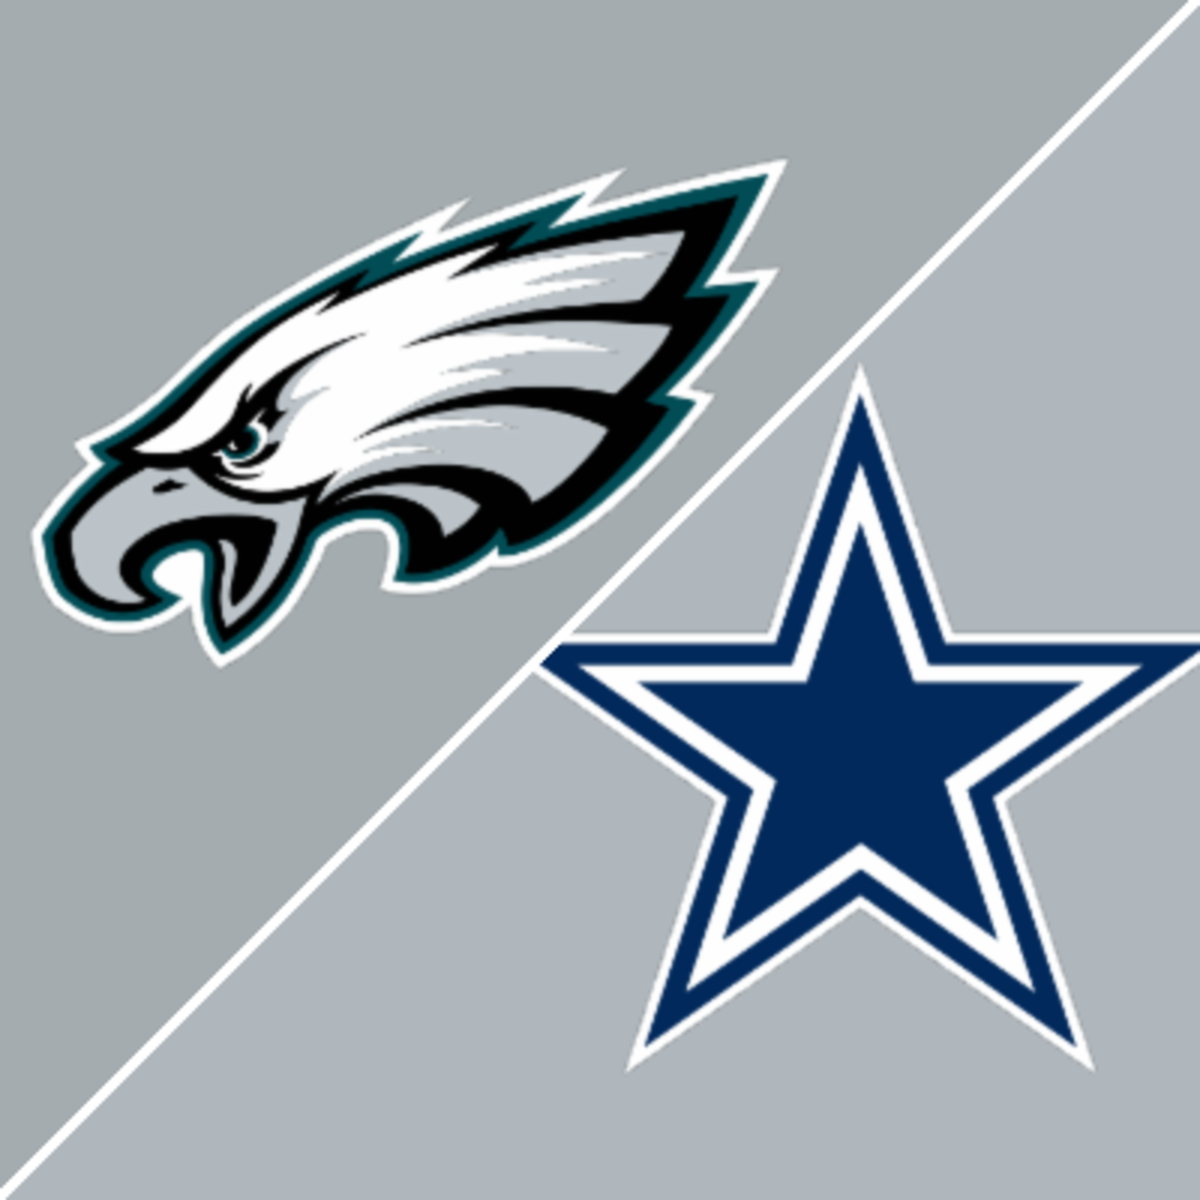 Division rivals Dallas Cowboys vs. Philadelphia Eagles